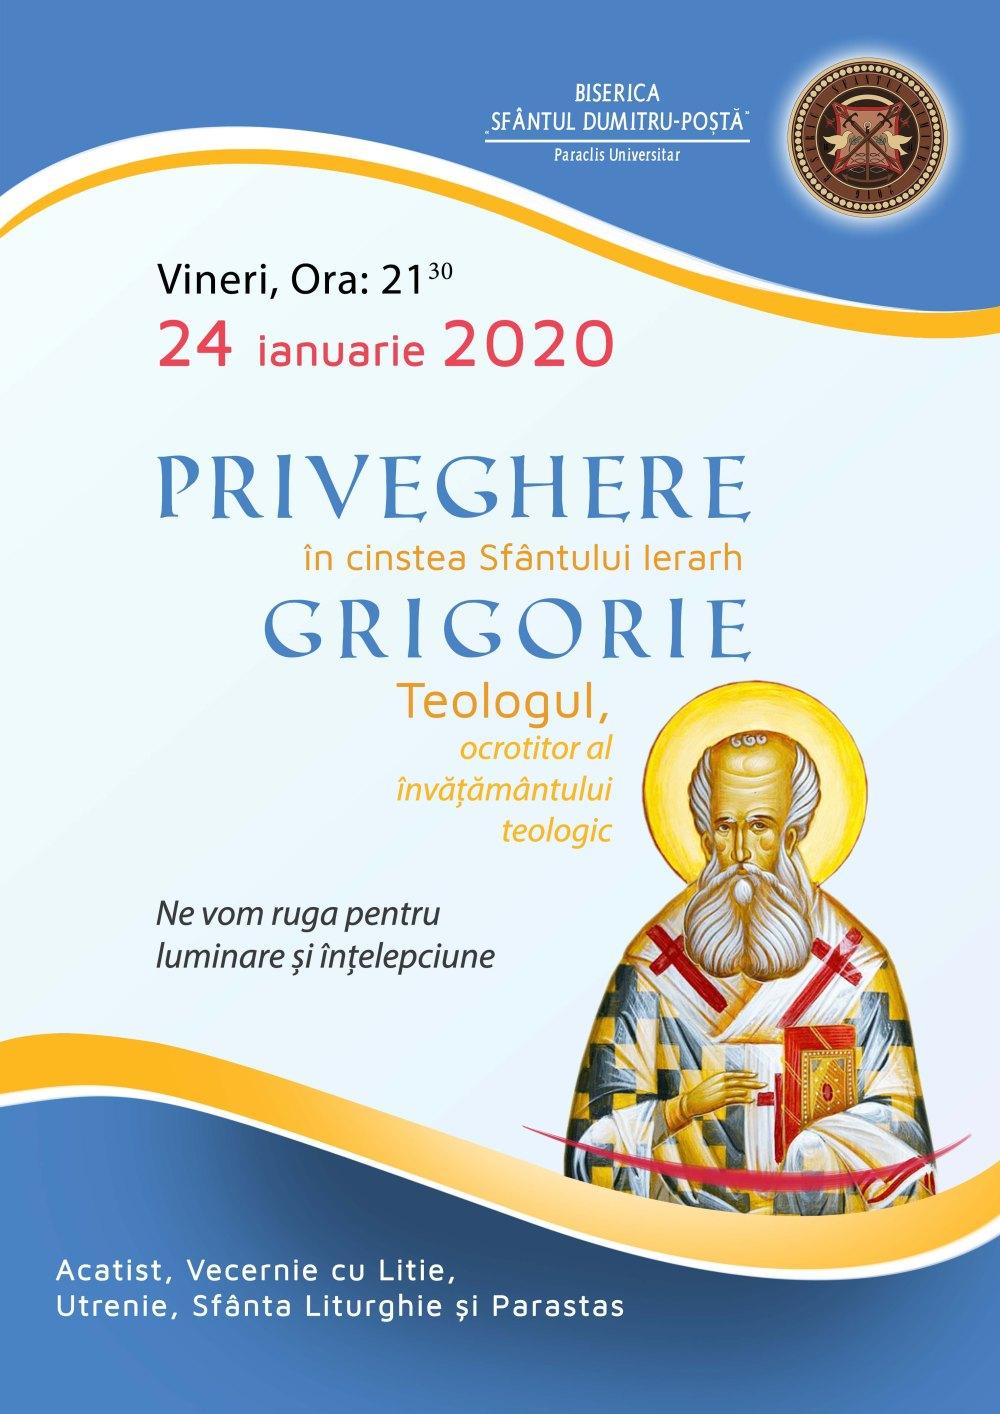 afis priveghi sf. Grigorie Teologul